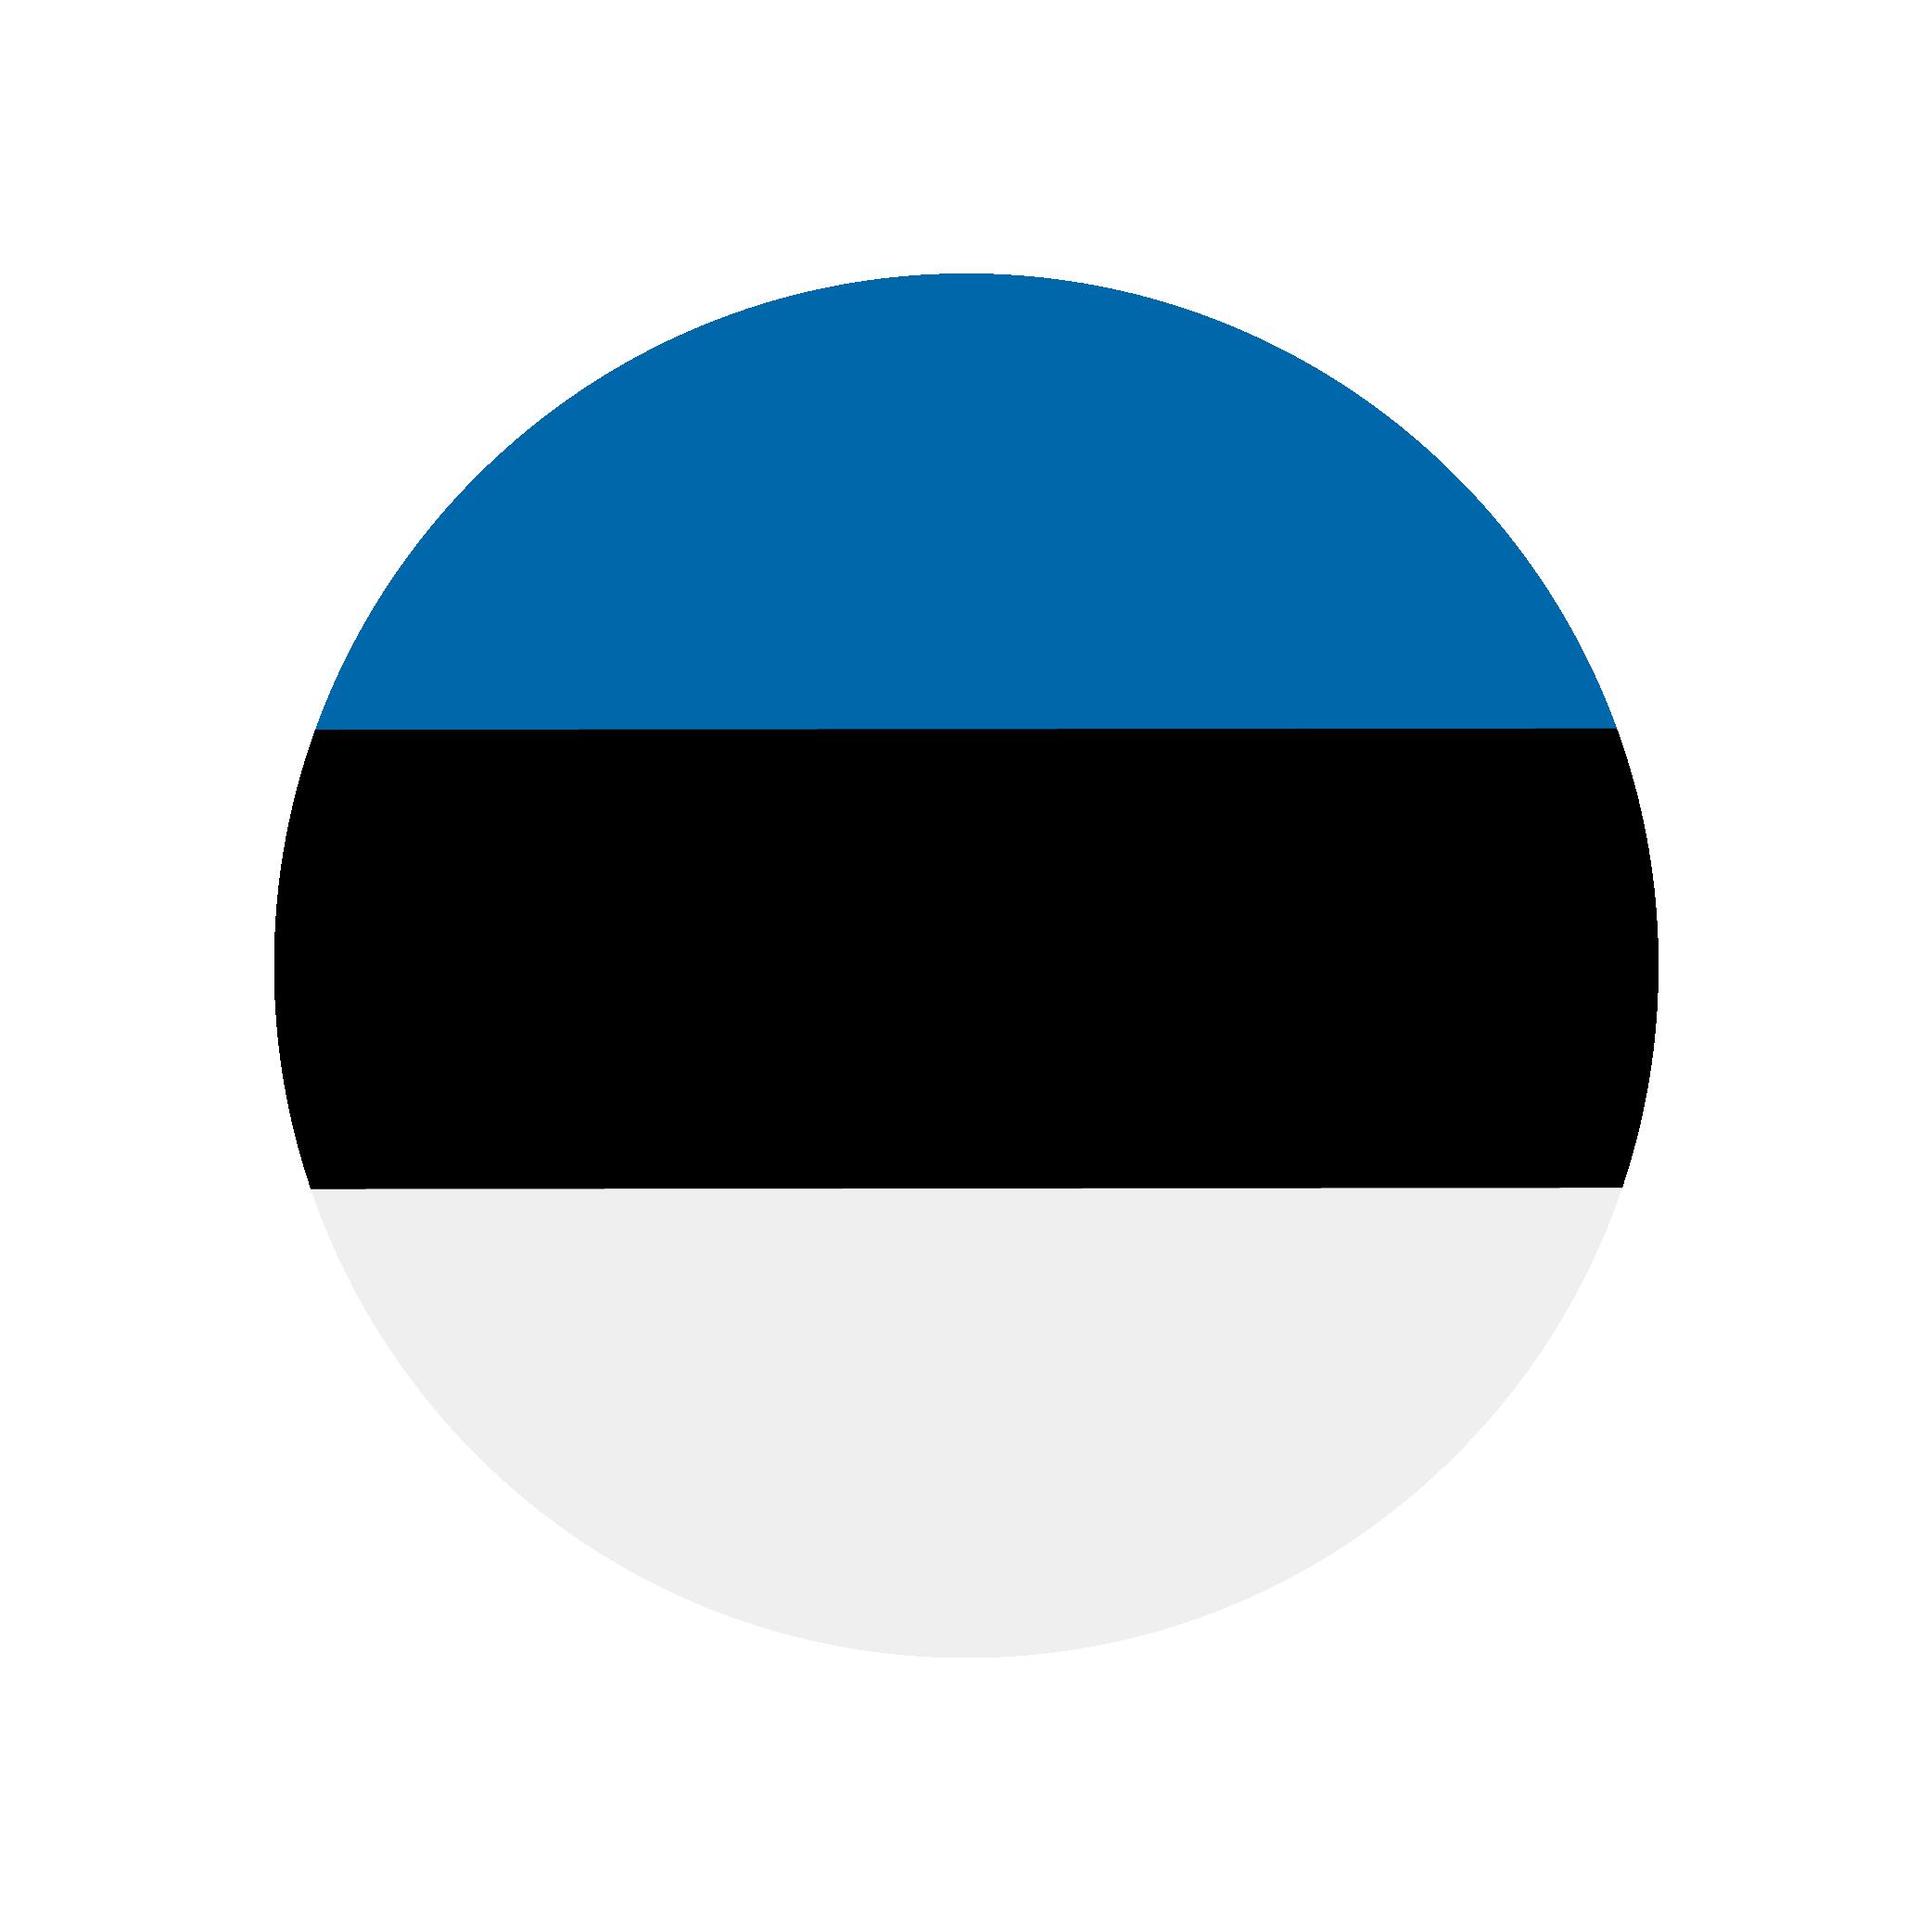 Flag-Country_Estonia_Estonia.png